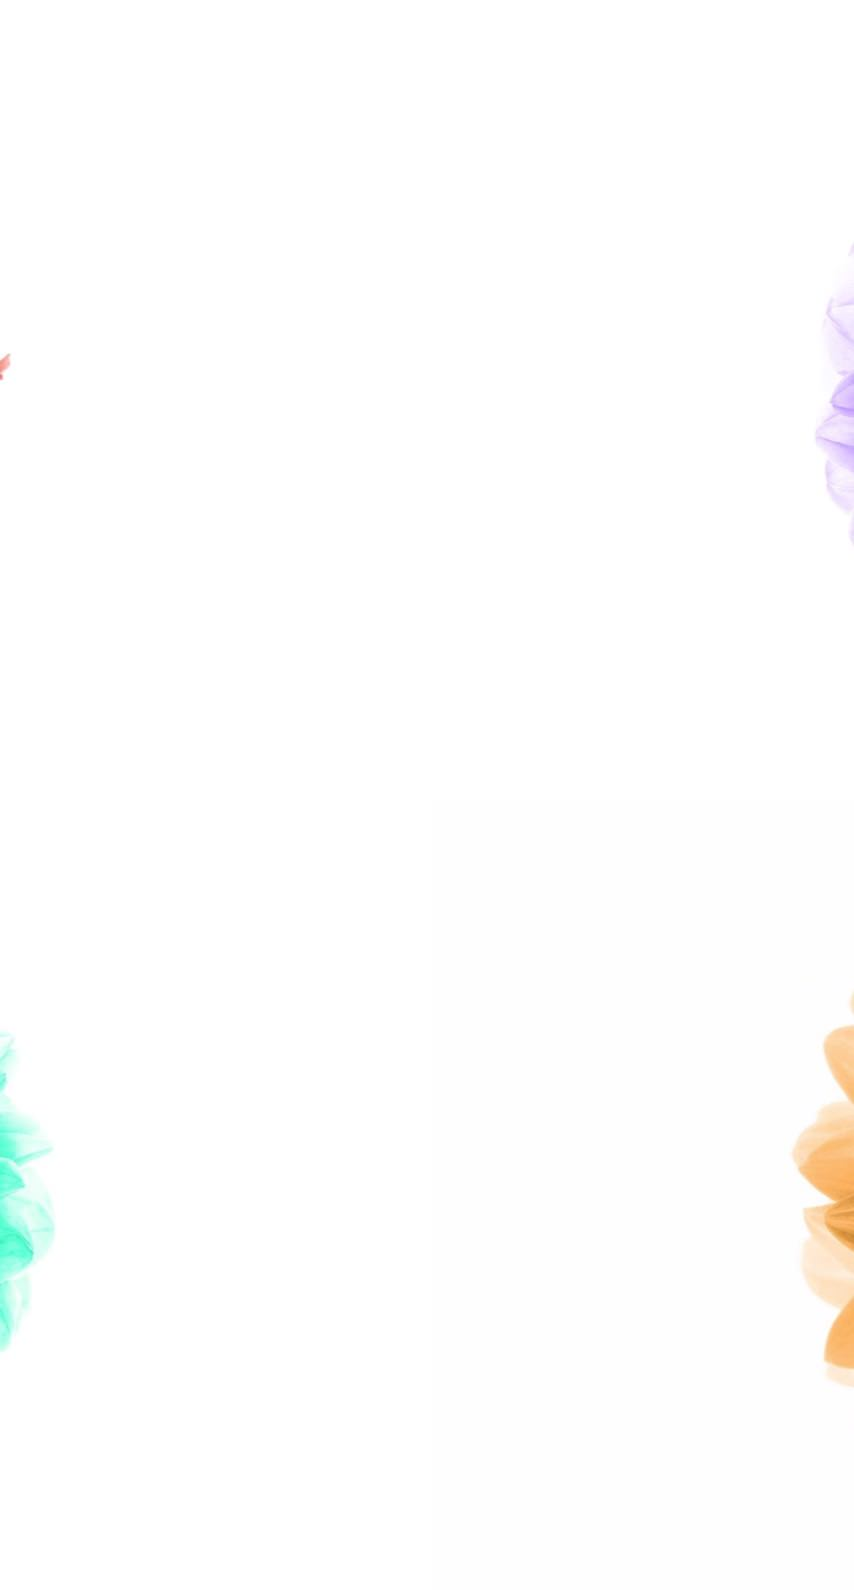 Unduh 400+ Wallpaper Hitam Polos Iphone  Gratis